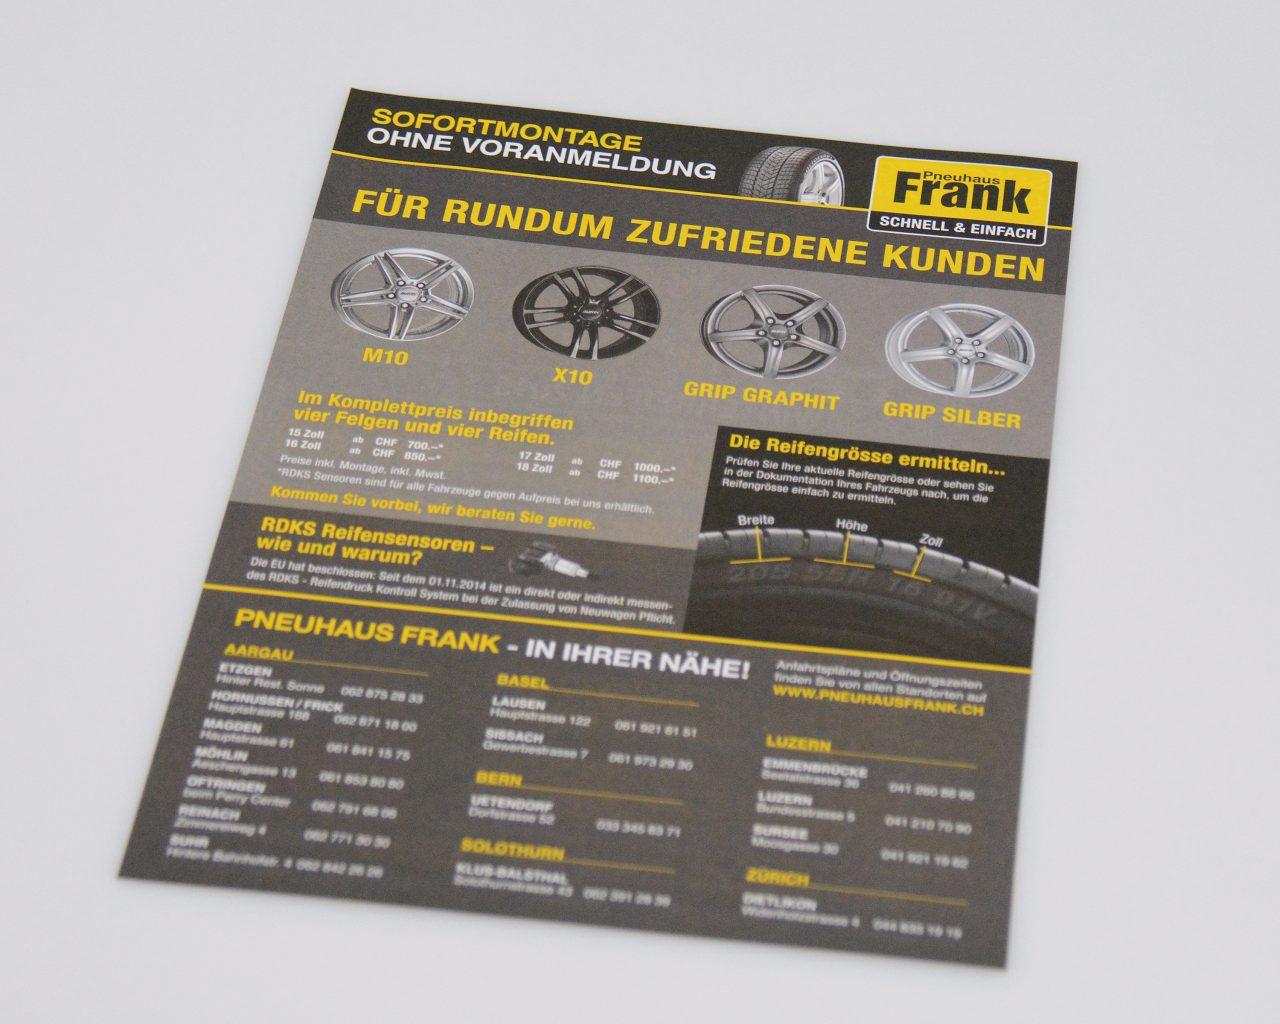 pneuhausfrank-02